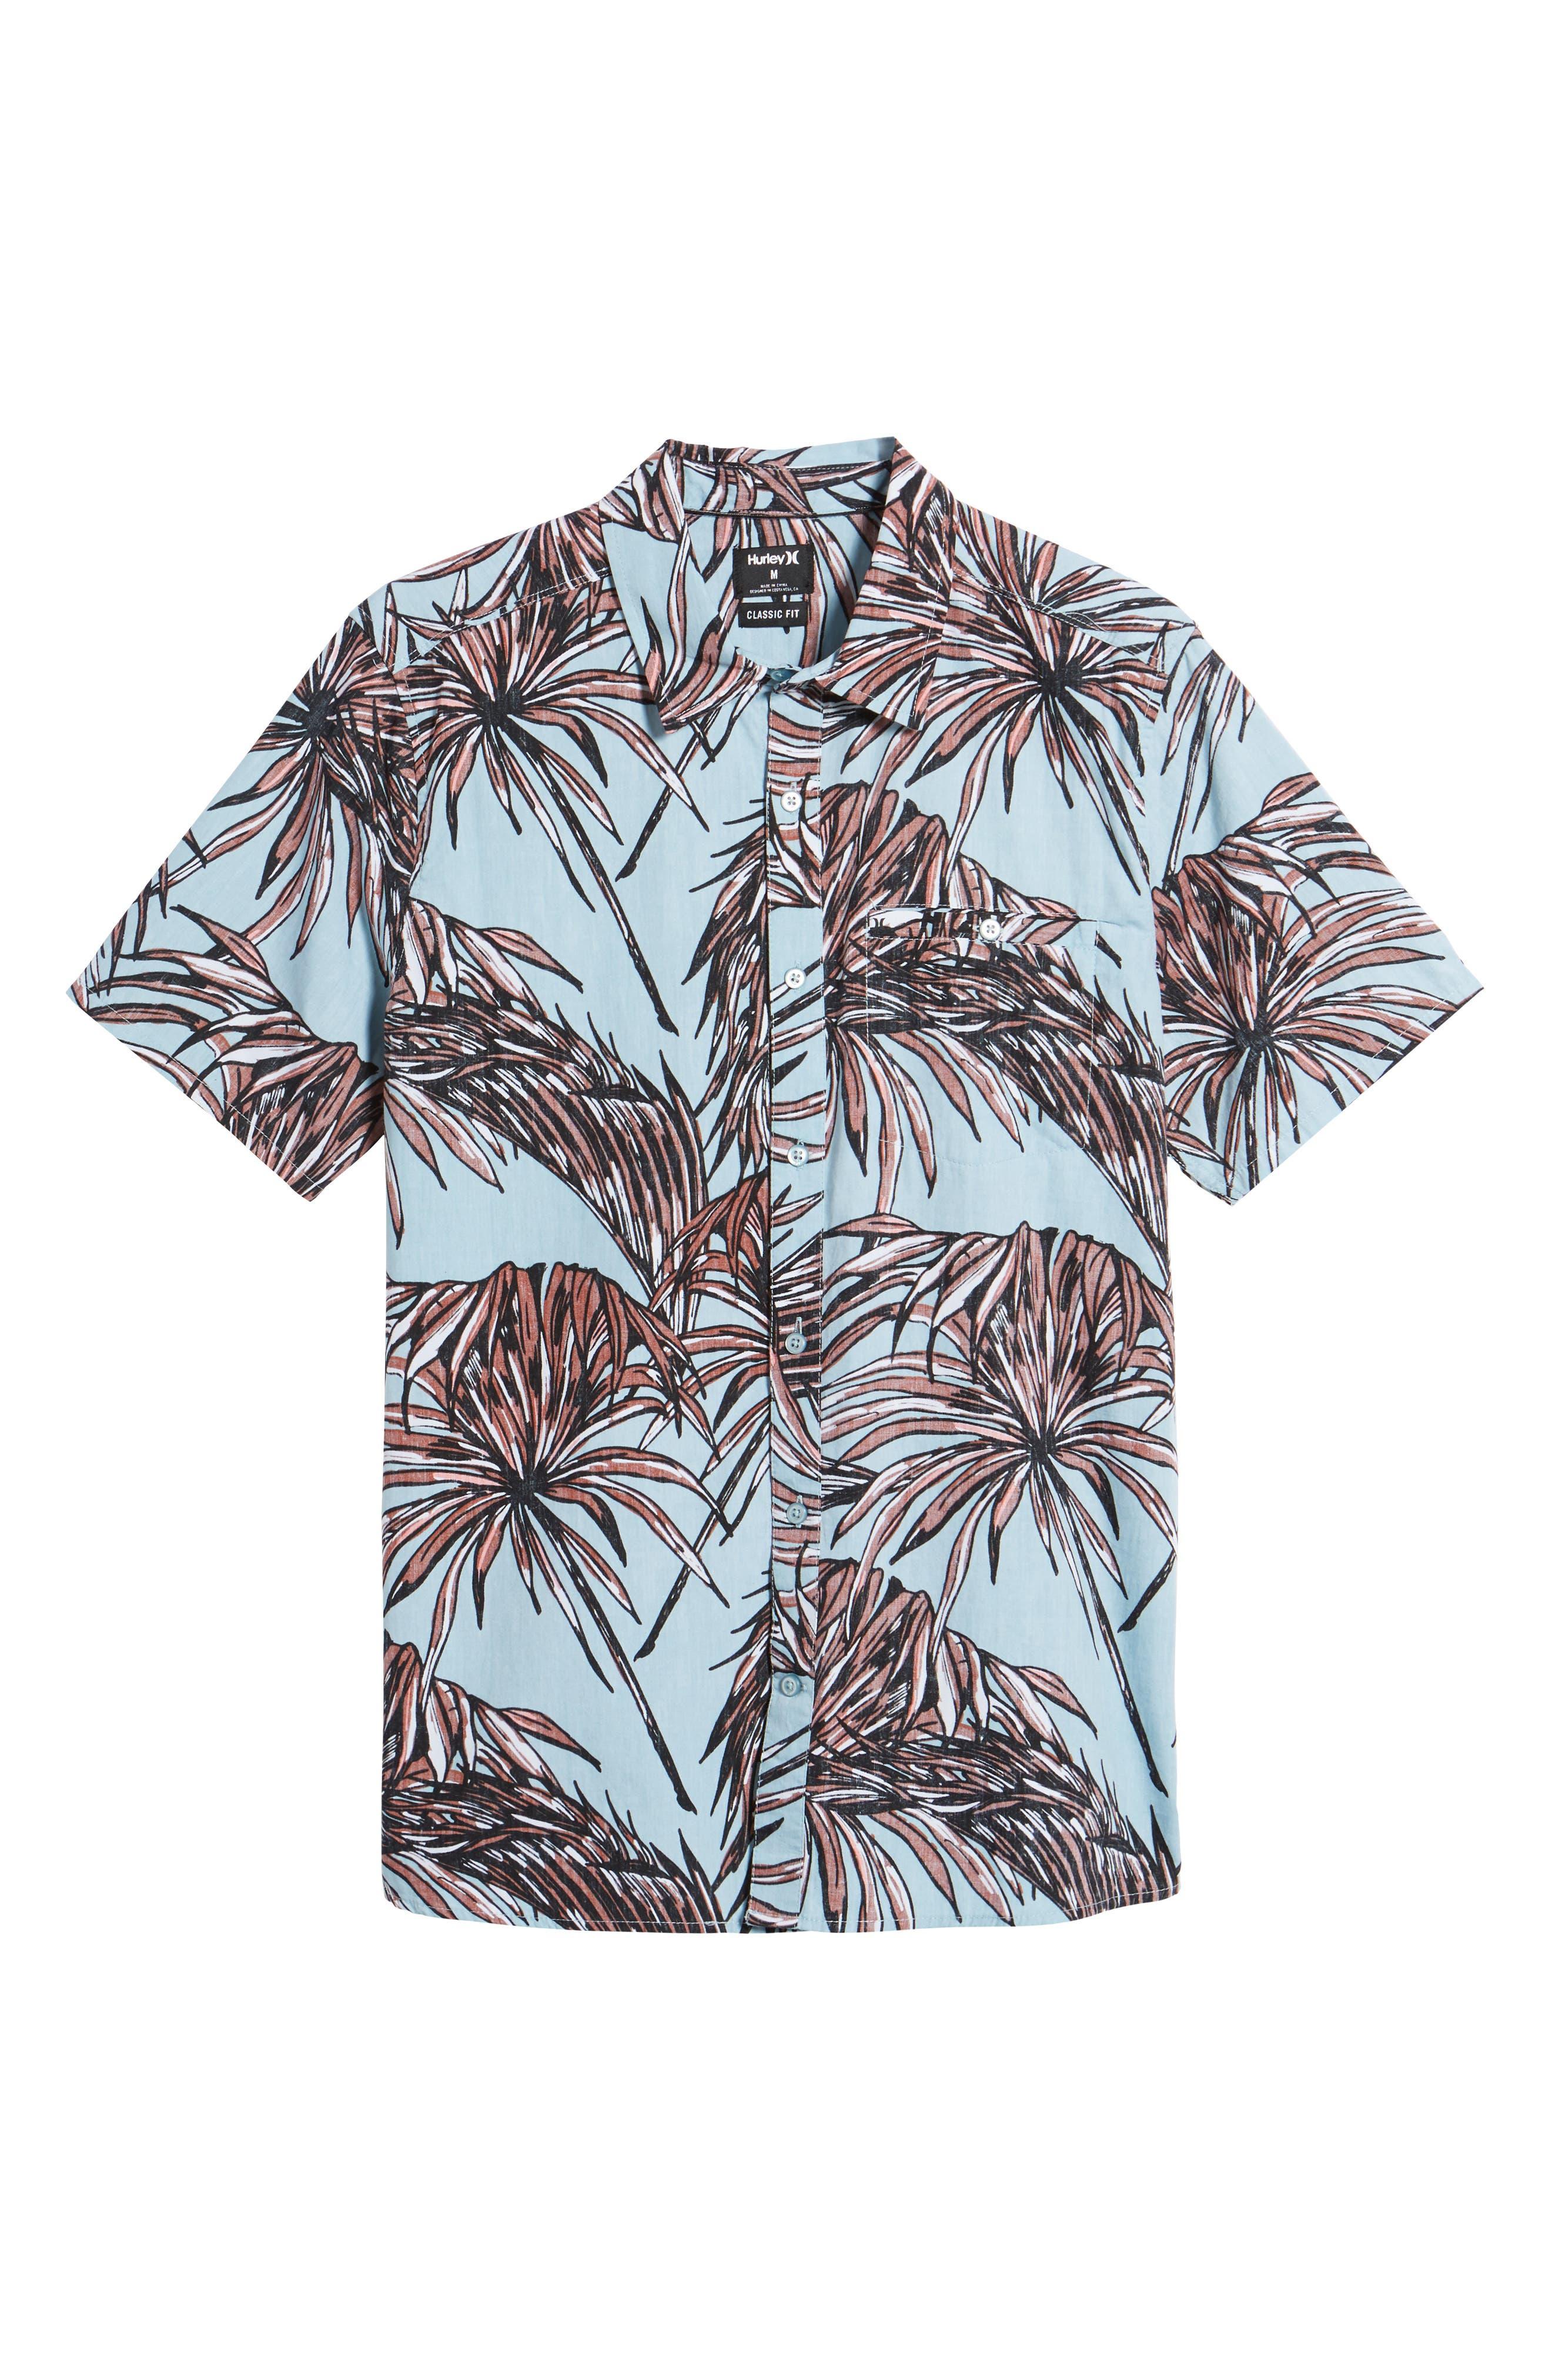 Koko Shirt,                             Alternate thumbnail 6, color,                             Ocean Bliss